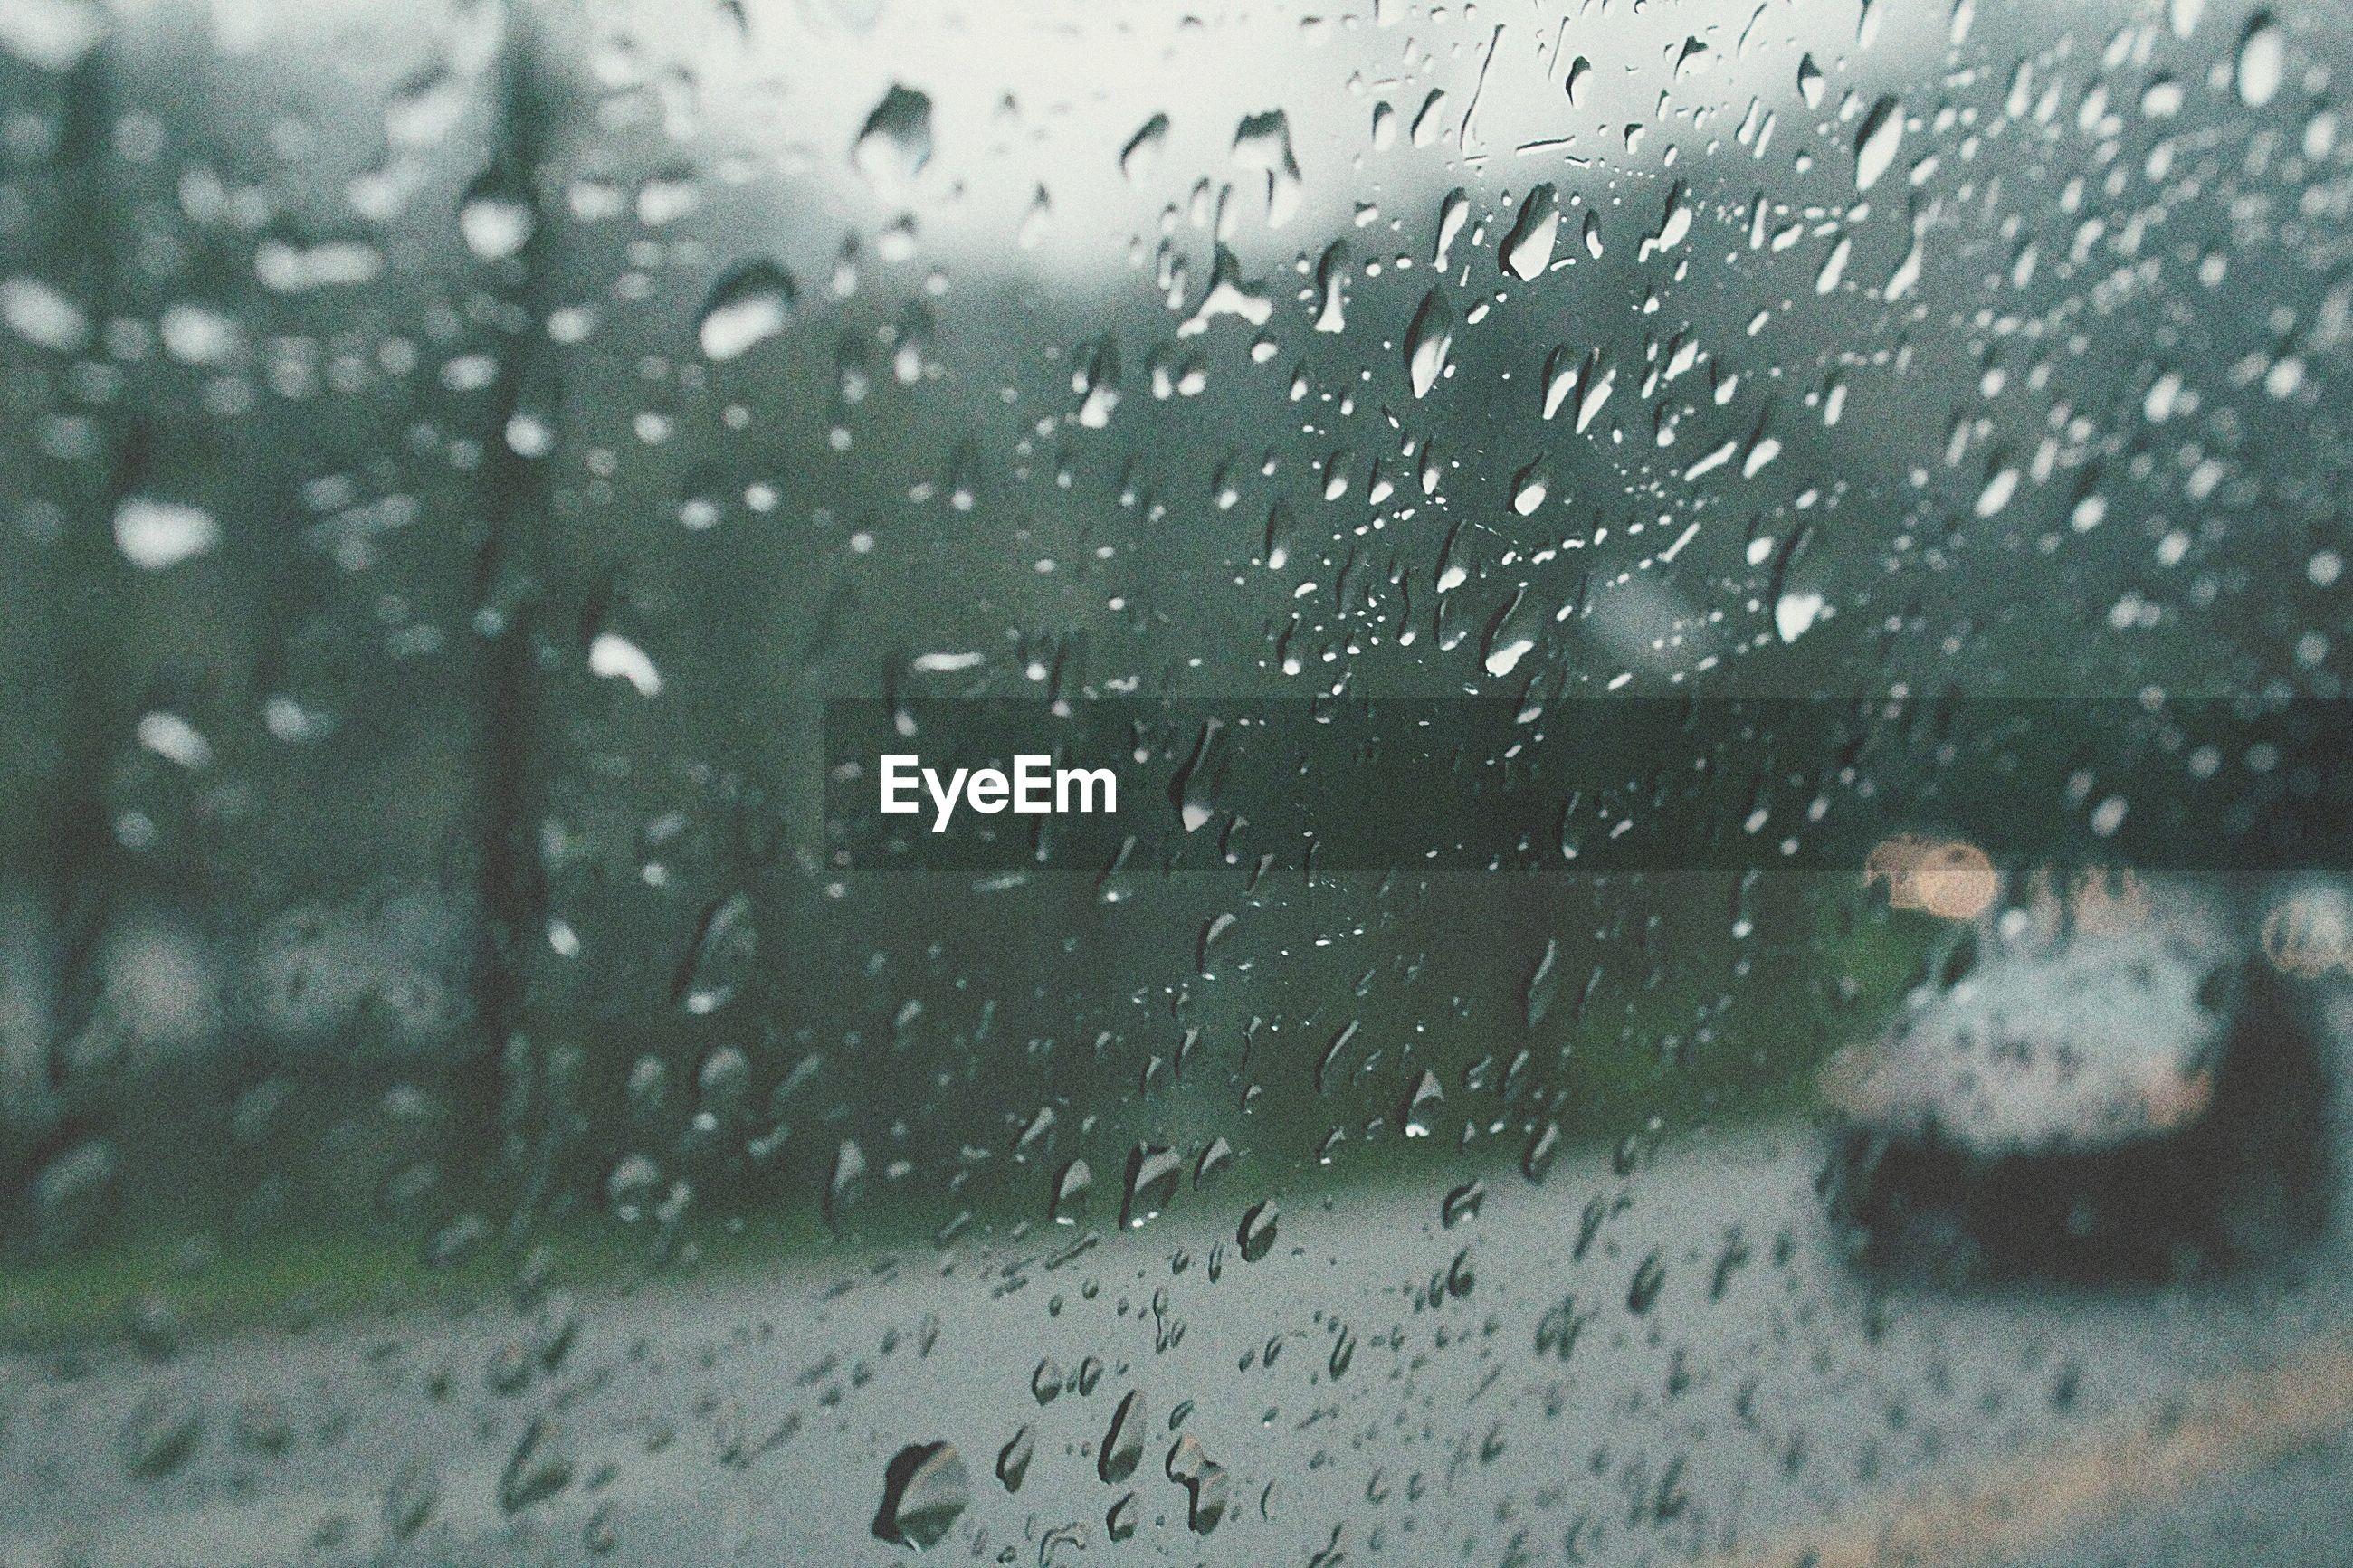 window, transparent, glass - material, wet, drop, rain, water, indoors, transportation, weather, season, car, raindrop, vehicle interior, mode of transport, glass, full frame, land vehicle, backgrounds, monsoon